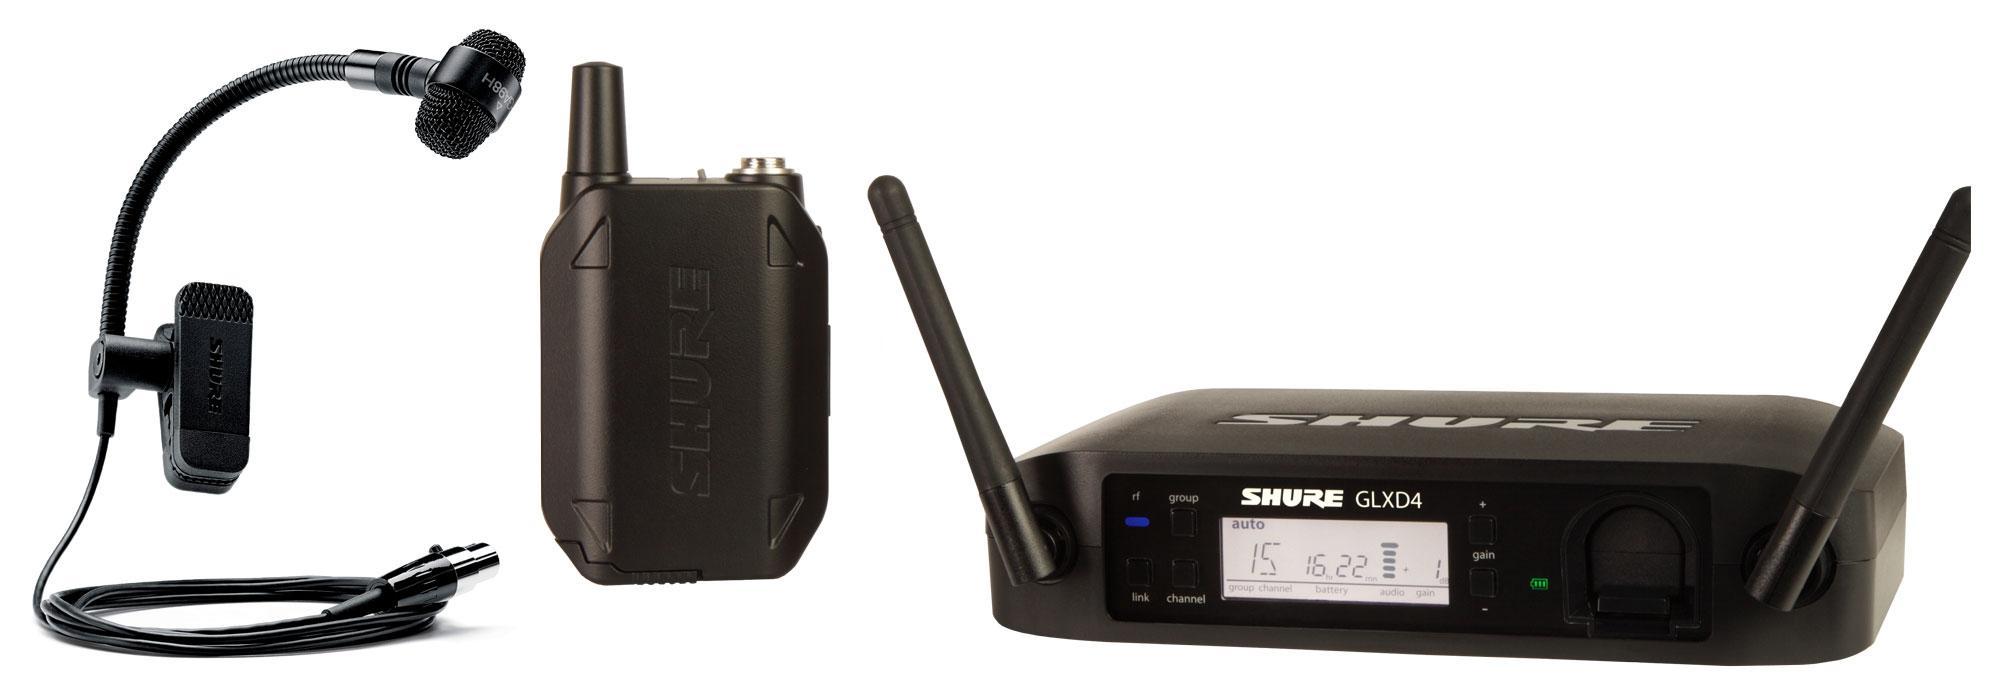 Shure GLXD14|P98H Digitales Funksystem mit PGA98H Instrumenten Clip Mikrofon